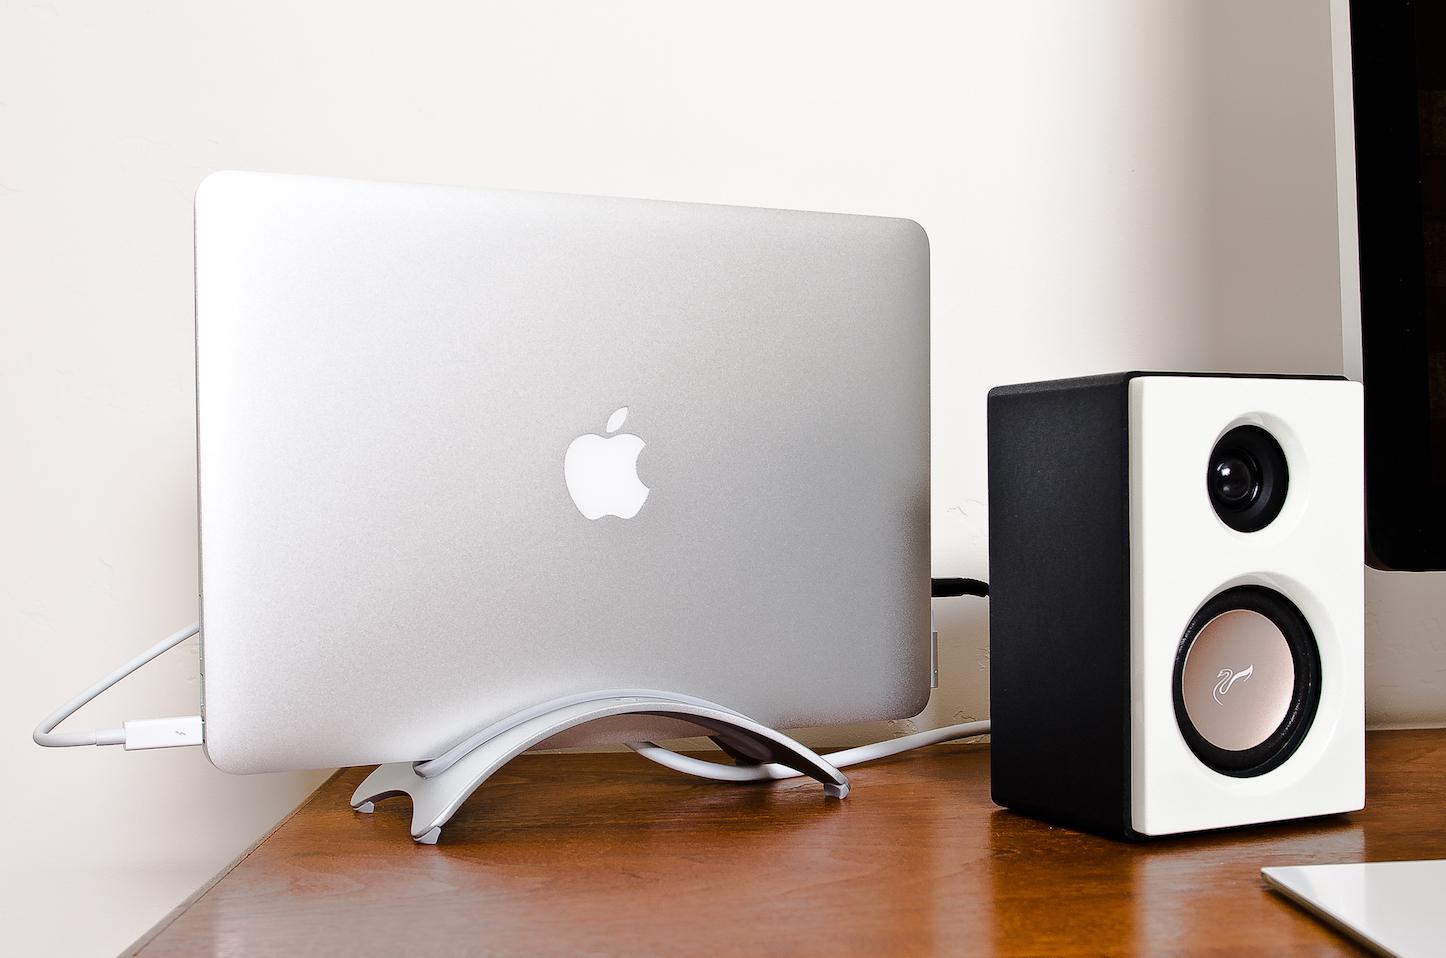 macbook-pro-clamb-shell-mode.jpg